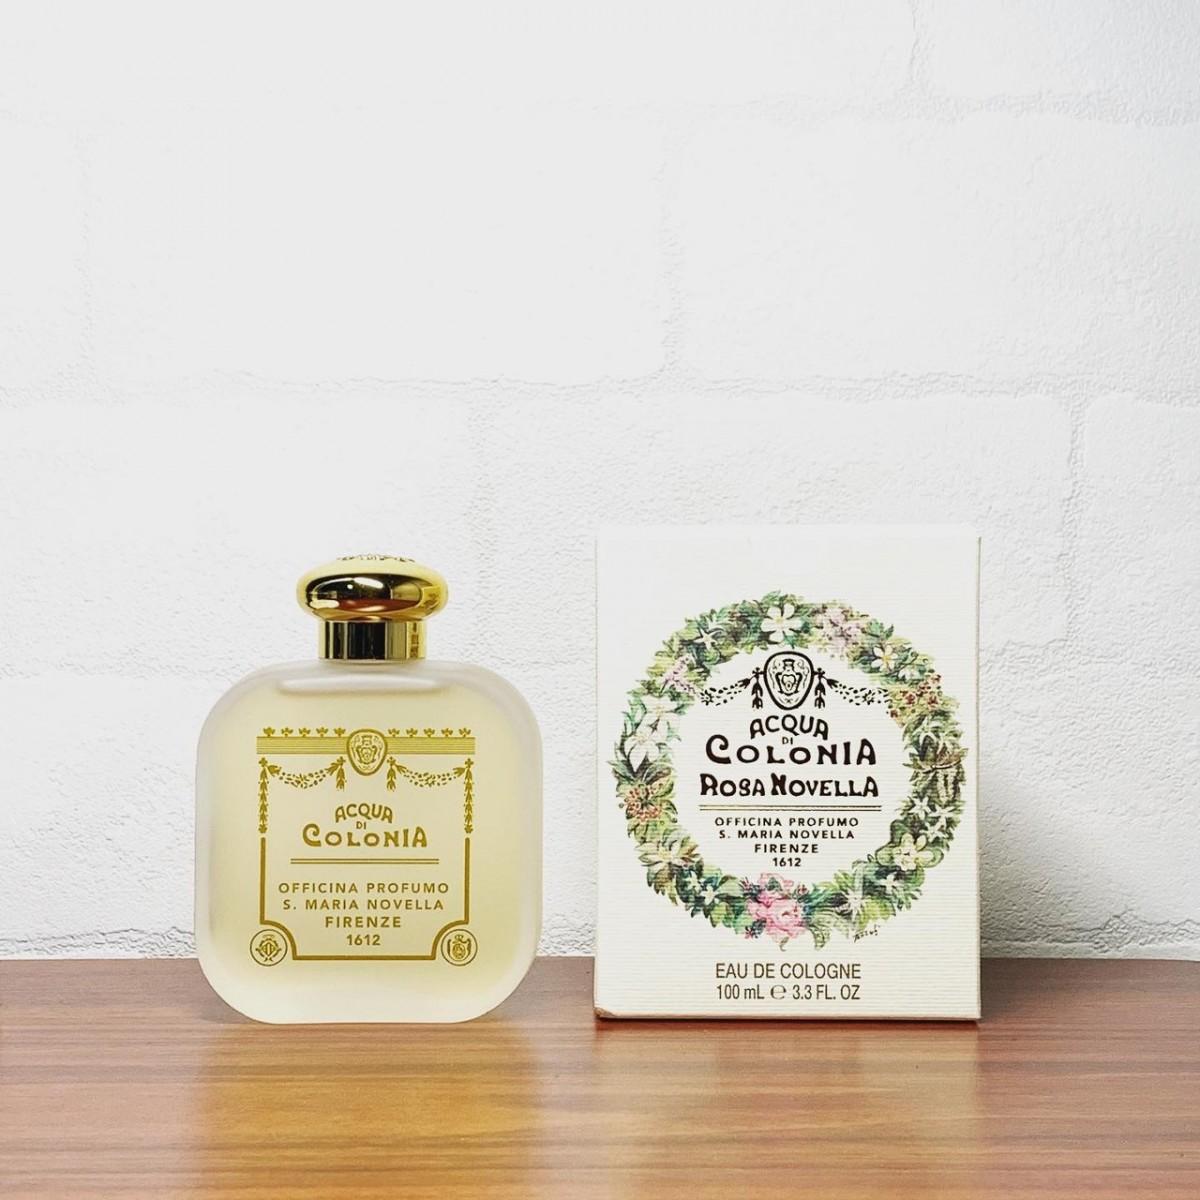 "<a href=""https://buy.smnovella.jp/7010399"">香りは「ローザノヴェッラ」シトラス香る爽やかさ。</a>"